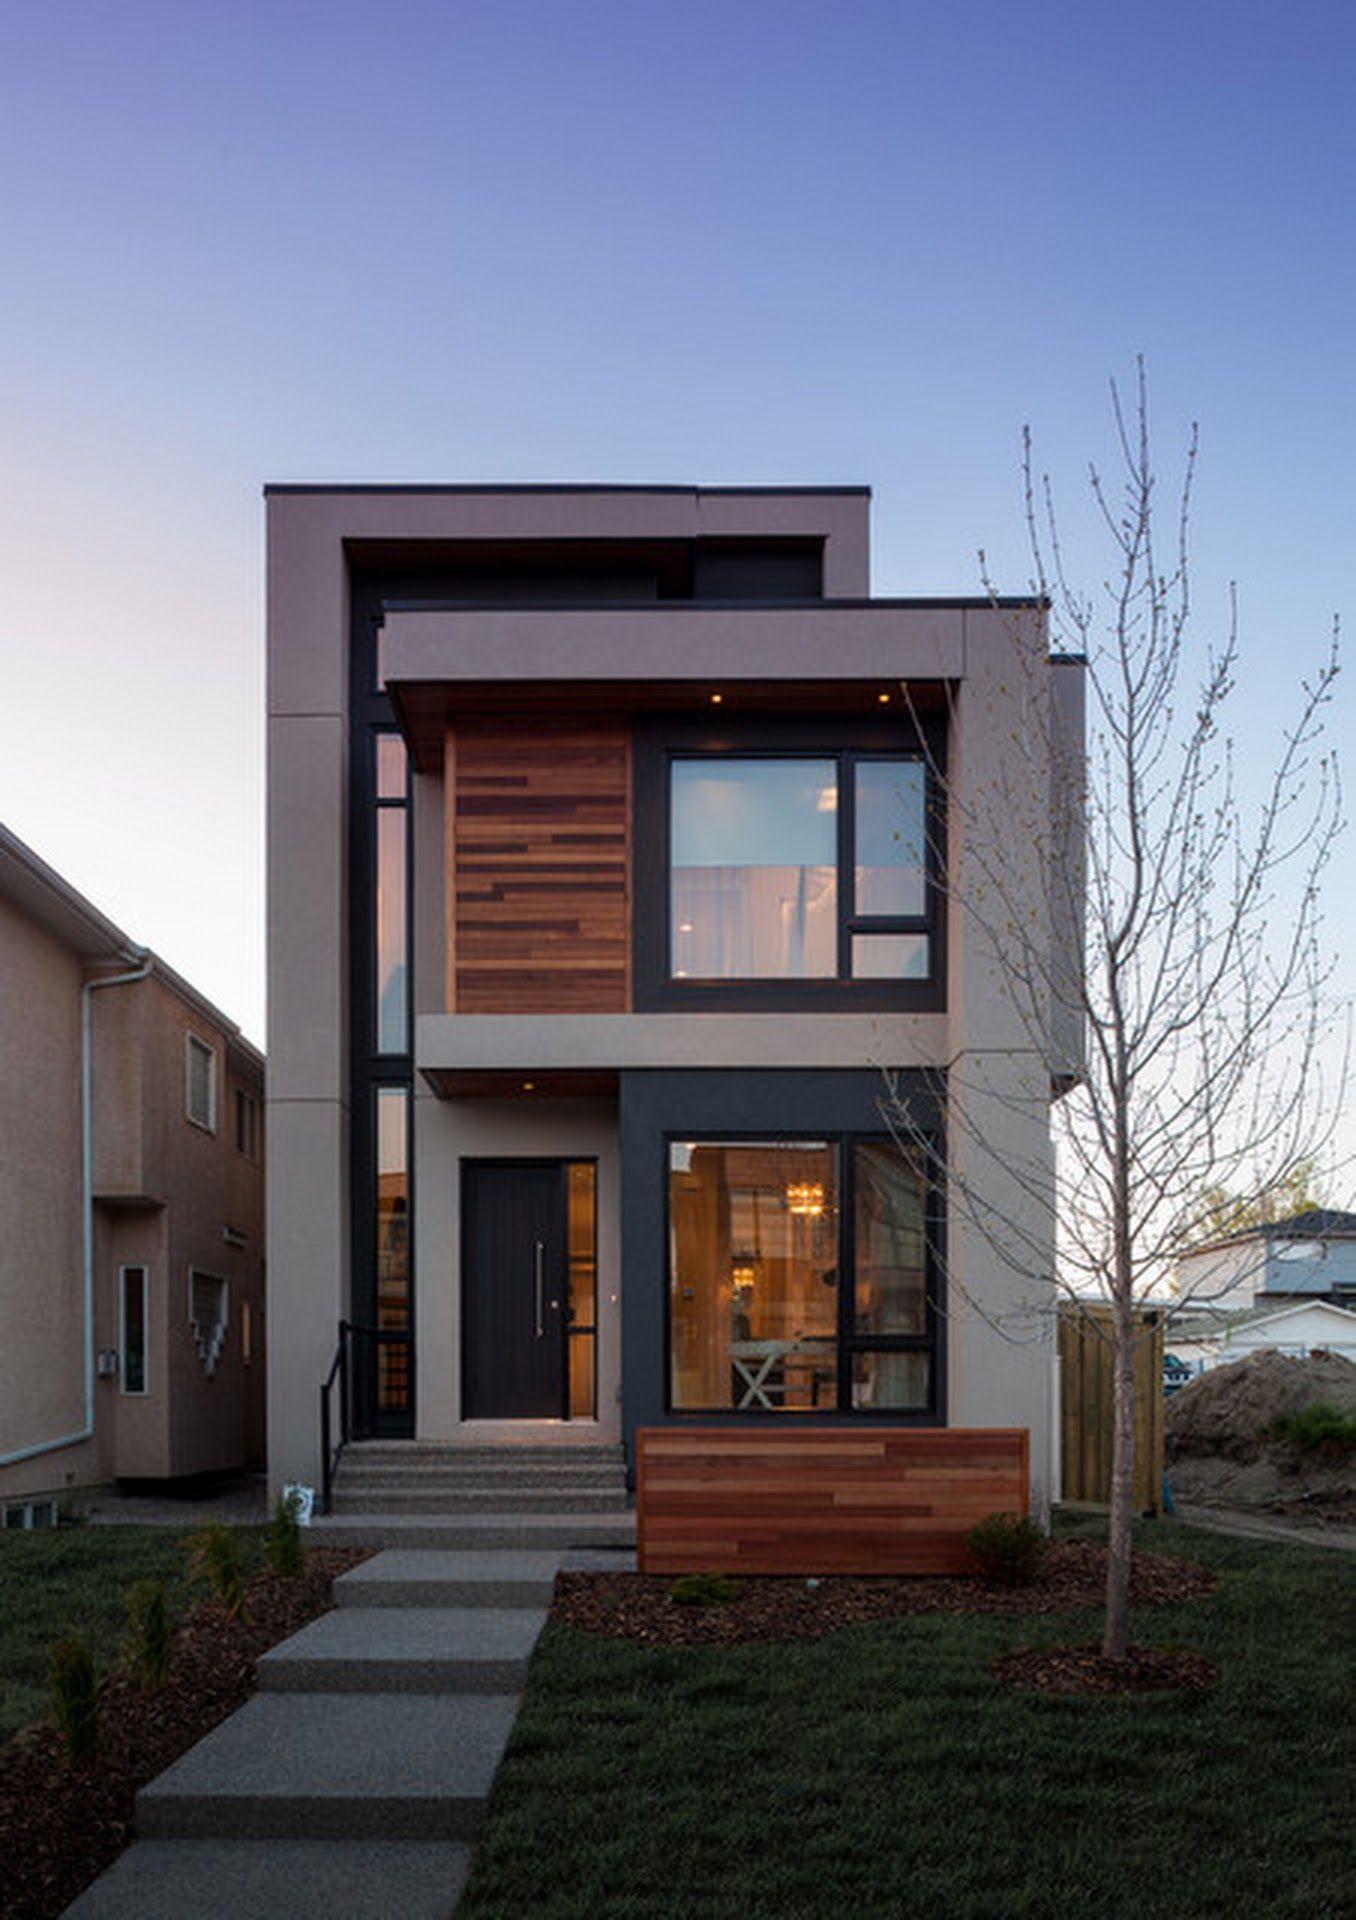 Pin by ayo paul on jjjj in pinterest house house design